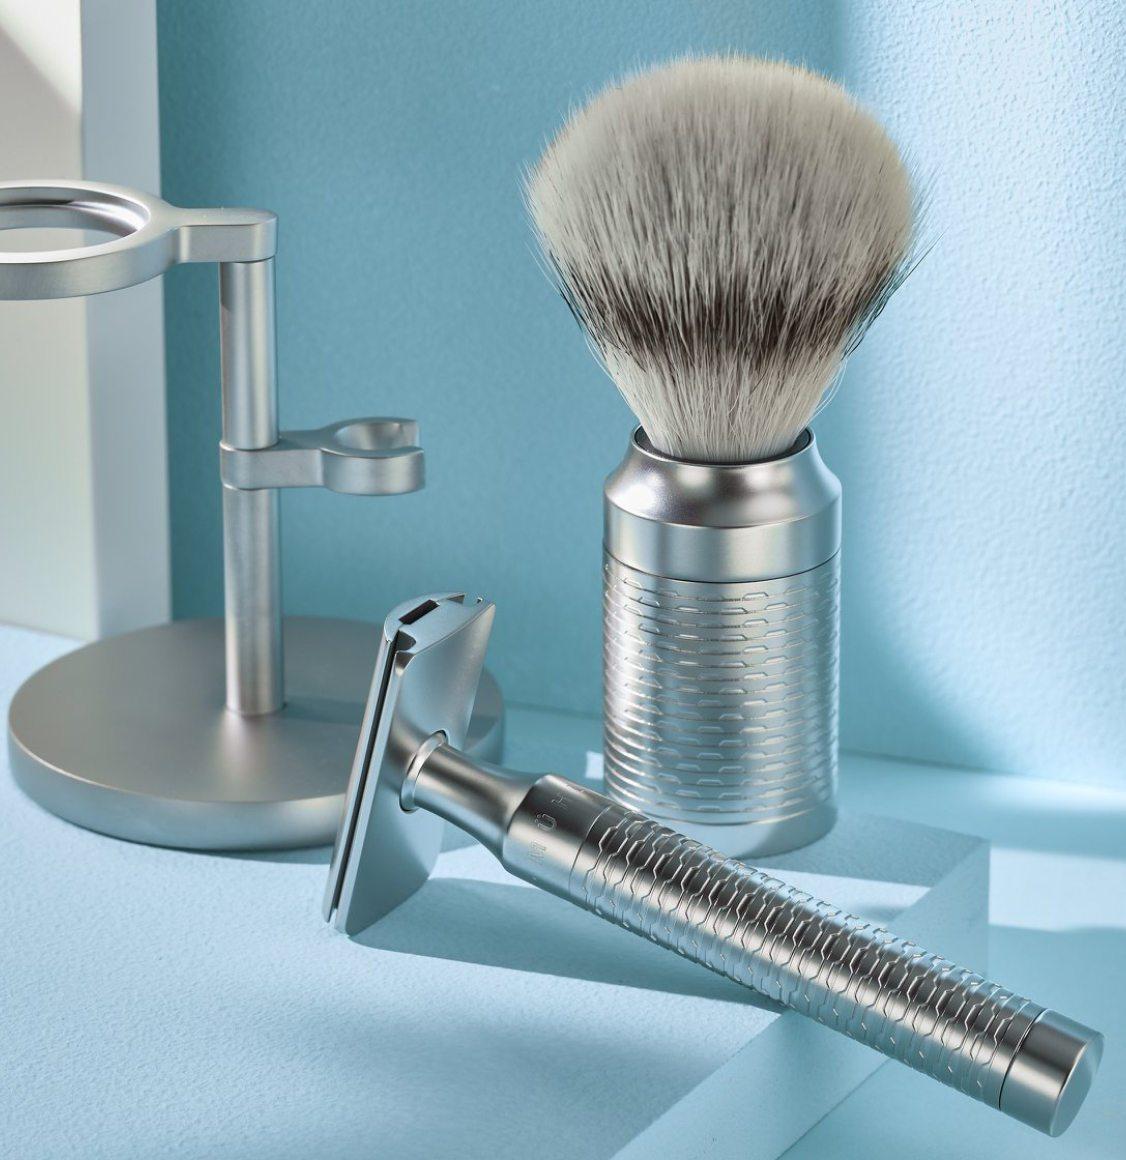 Muhle Rocca Silvertip Badger Brush